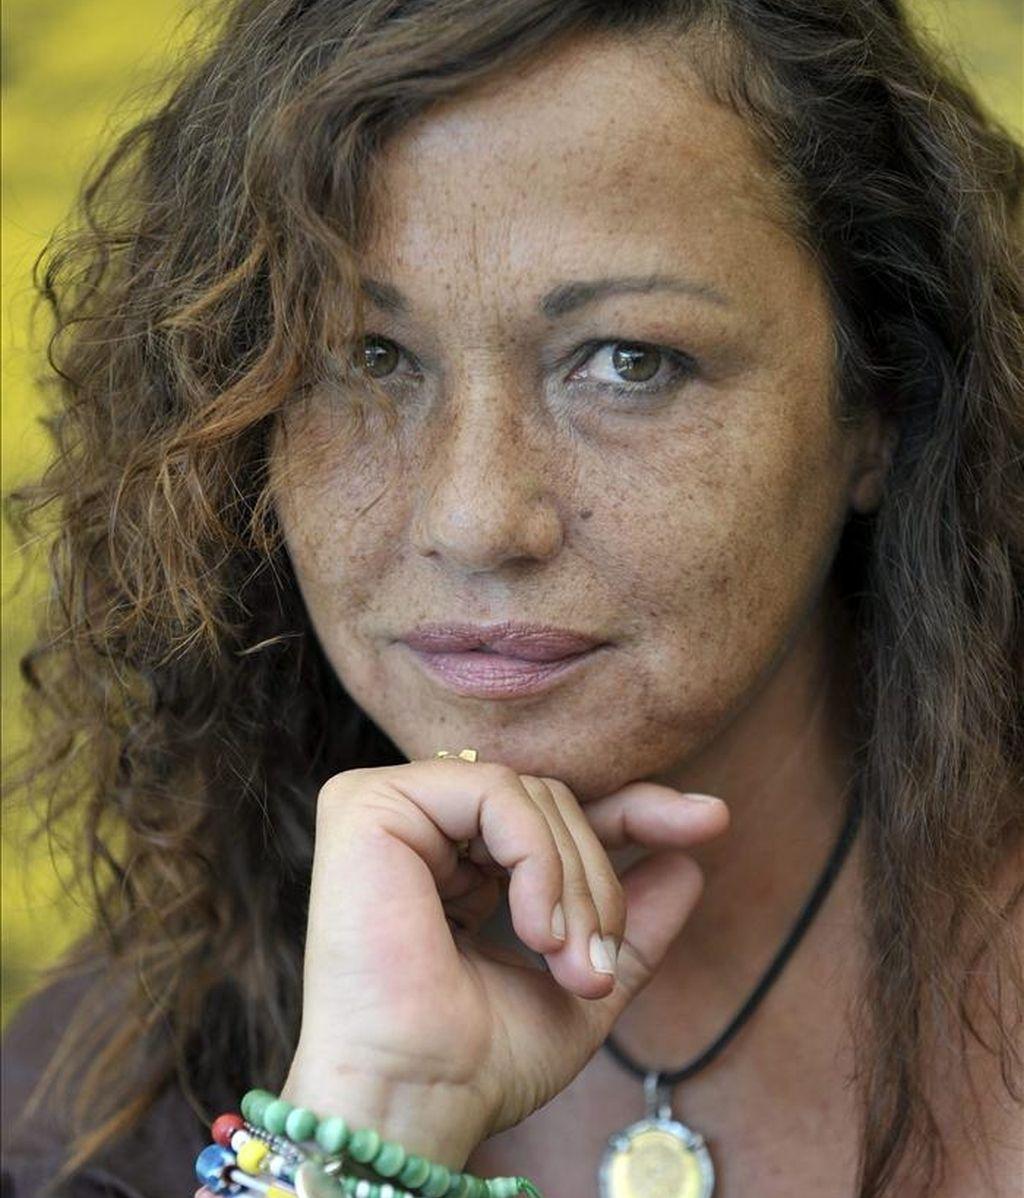 La actriz y fotógrafa española Eulalia Ramón. EFE/Archivo